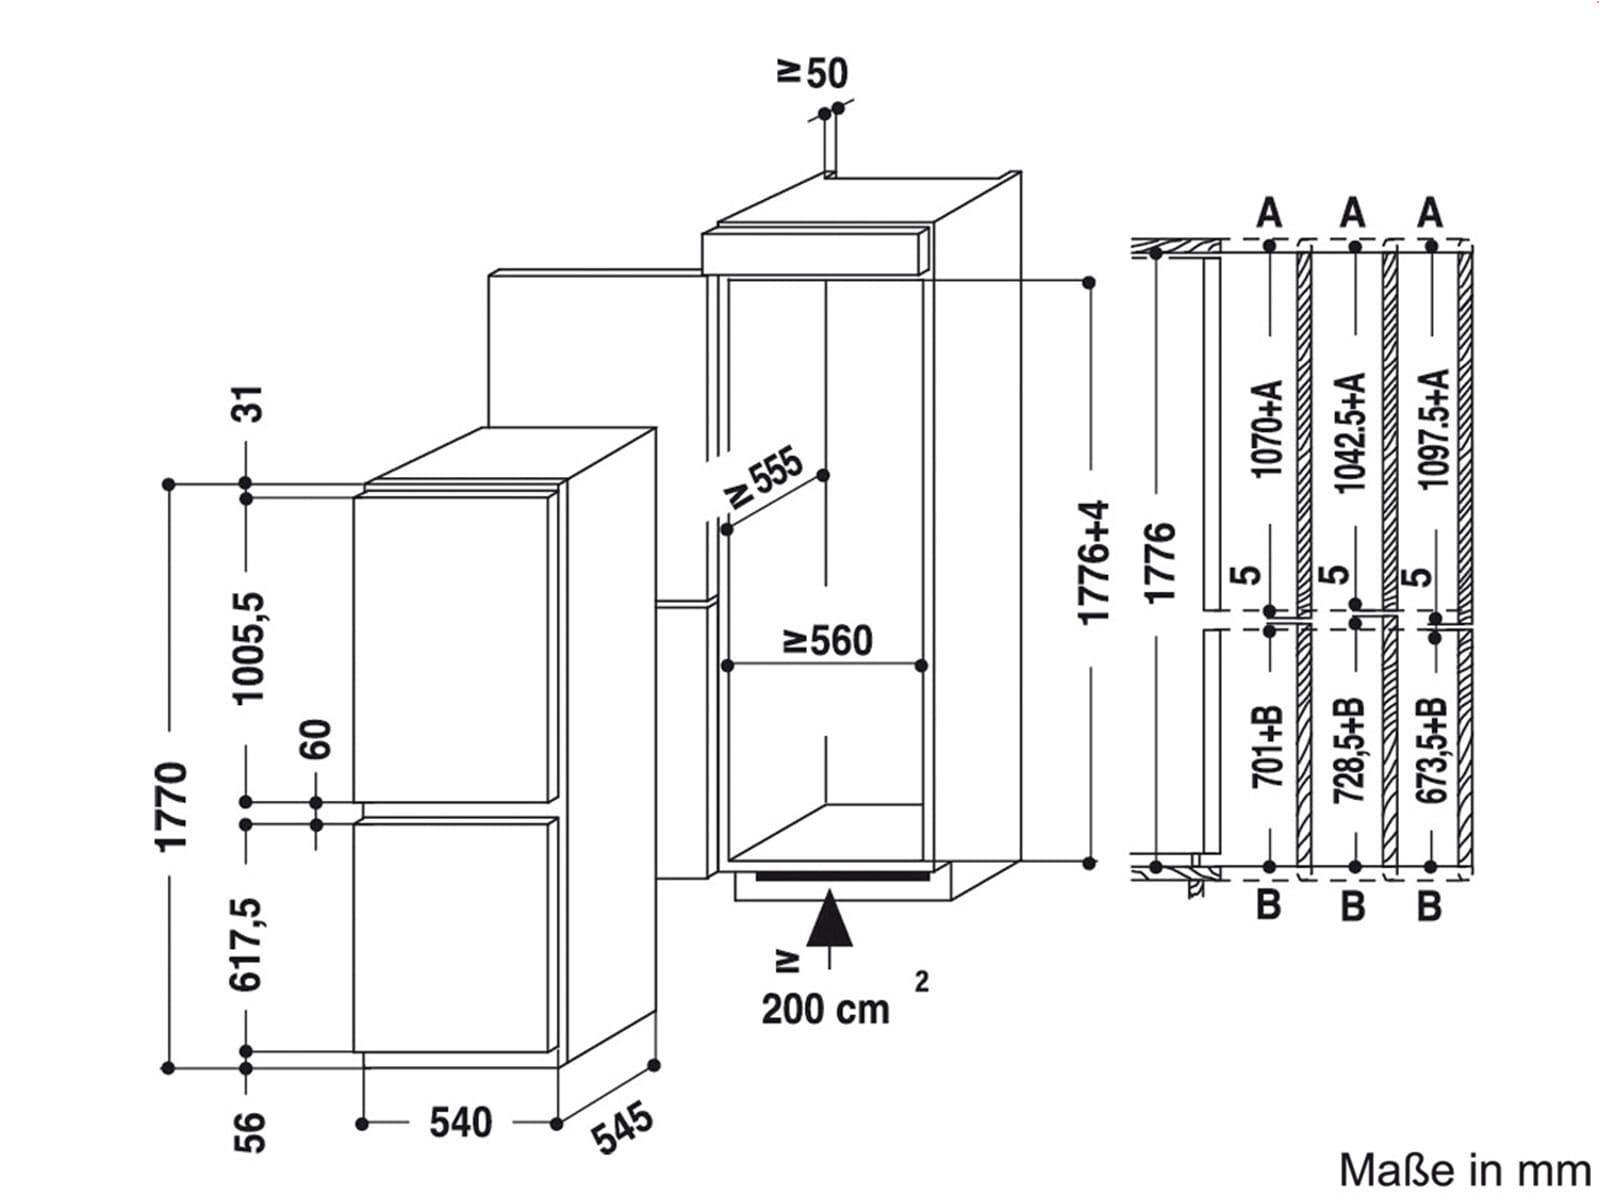 bauknecht kgin 3183 a einbau k hl gefrierkombination. Black Bedroom Furniture Sets. Home Design Ideas